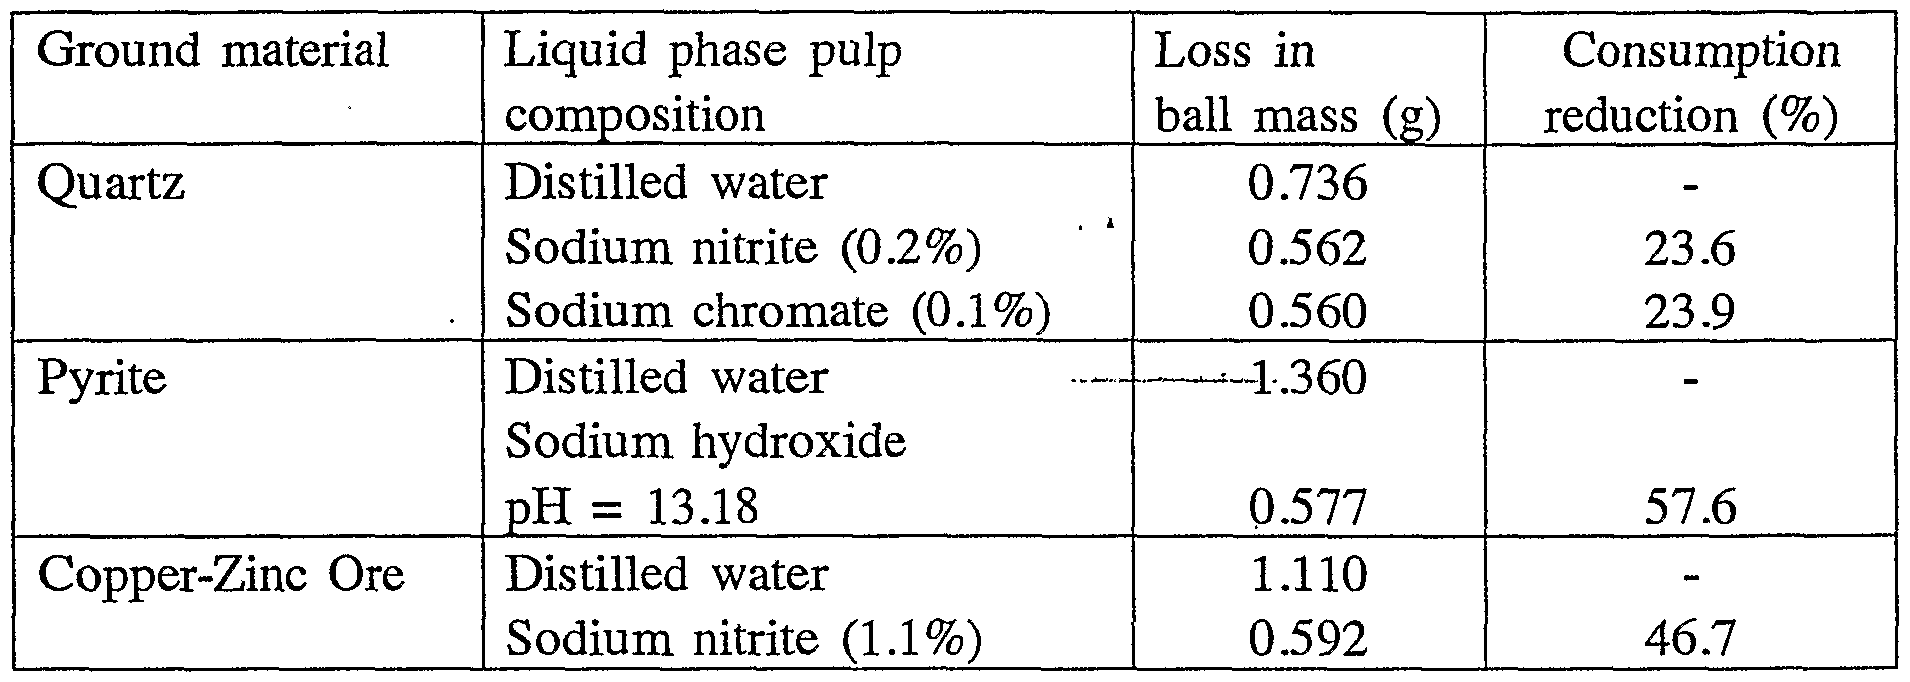 WO2003049867A1 - Selective flotation agent and flotation method